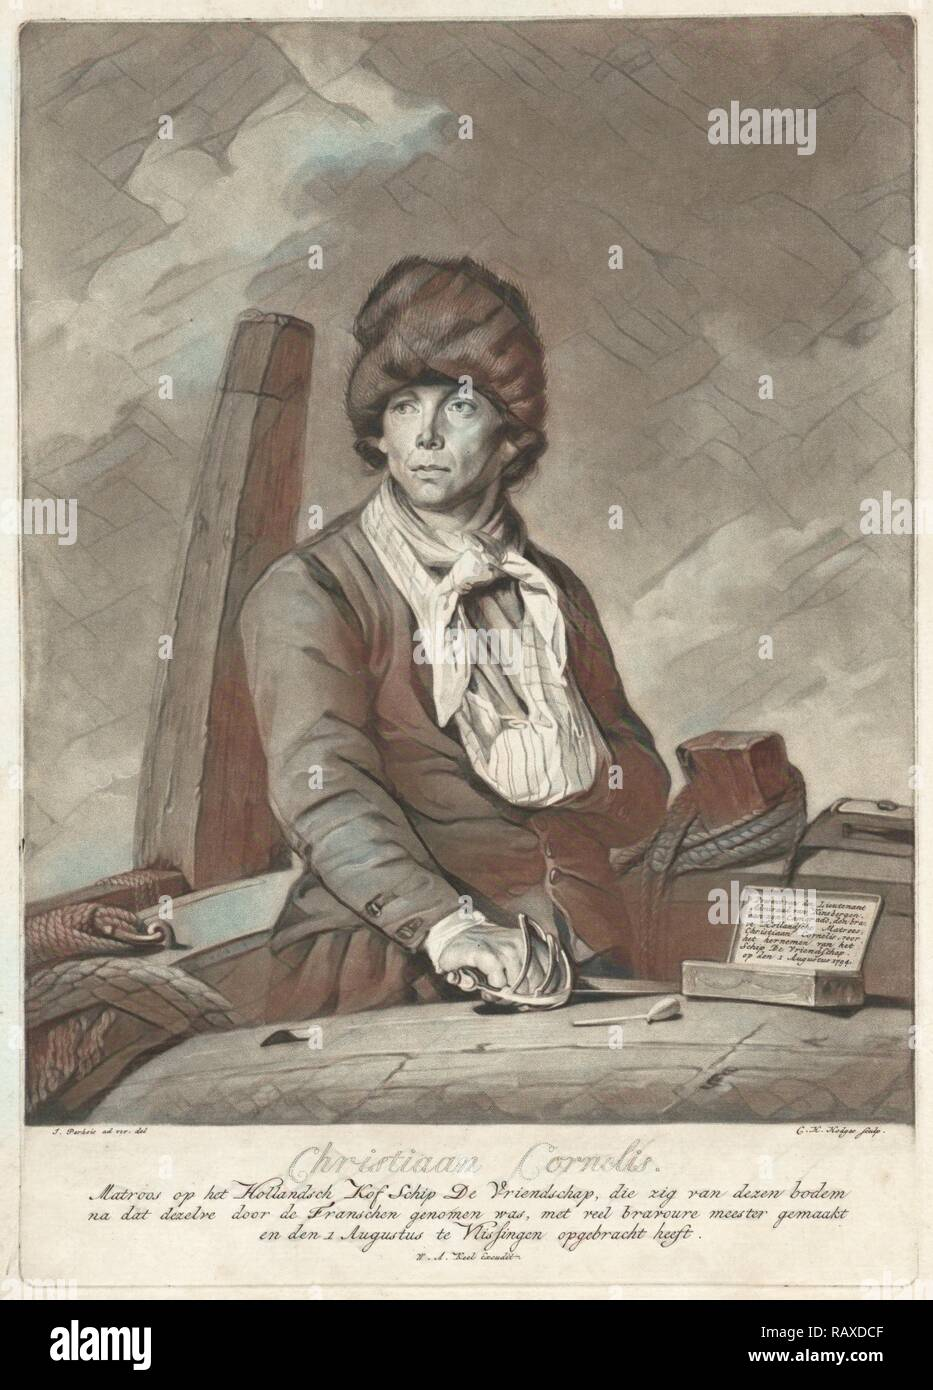 Portrait of Christiaan Cornelis, Charles Howard Hodges, William Alexander Keel, 1794-1796. Reimagined - Stock Image